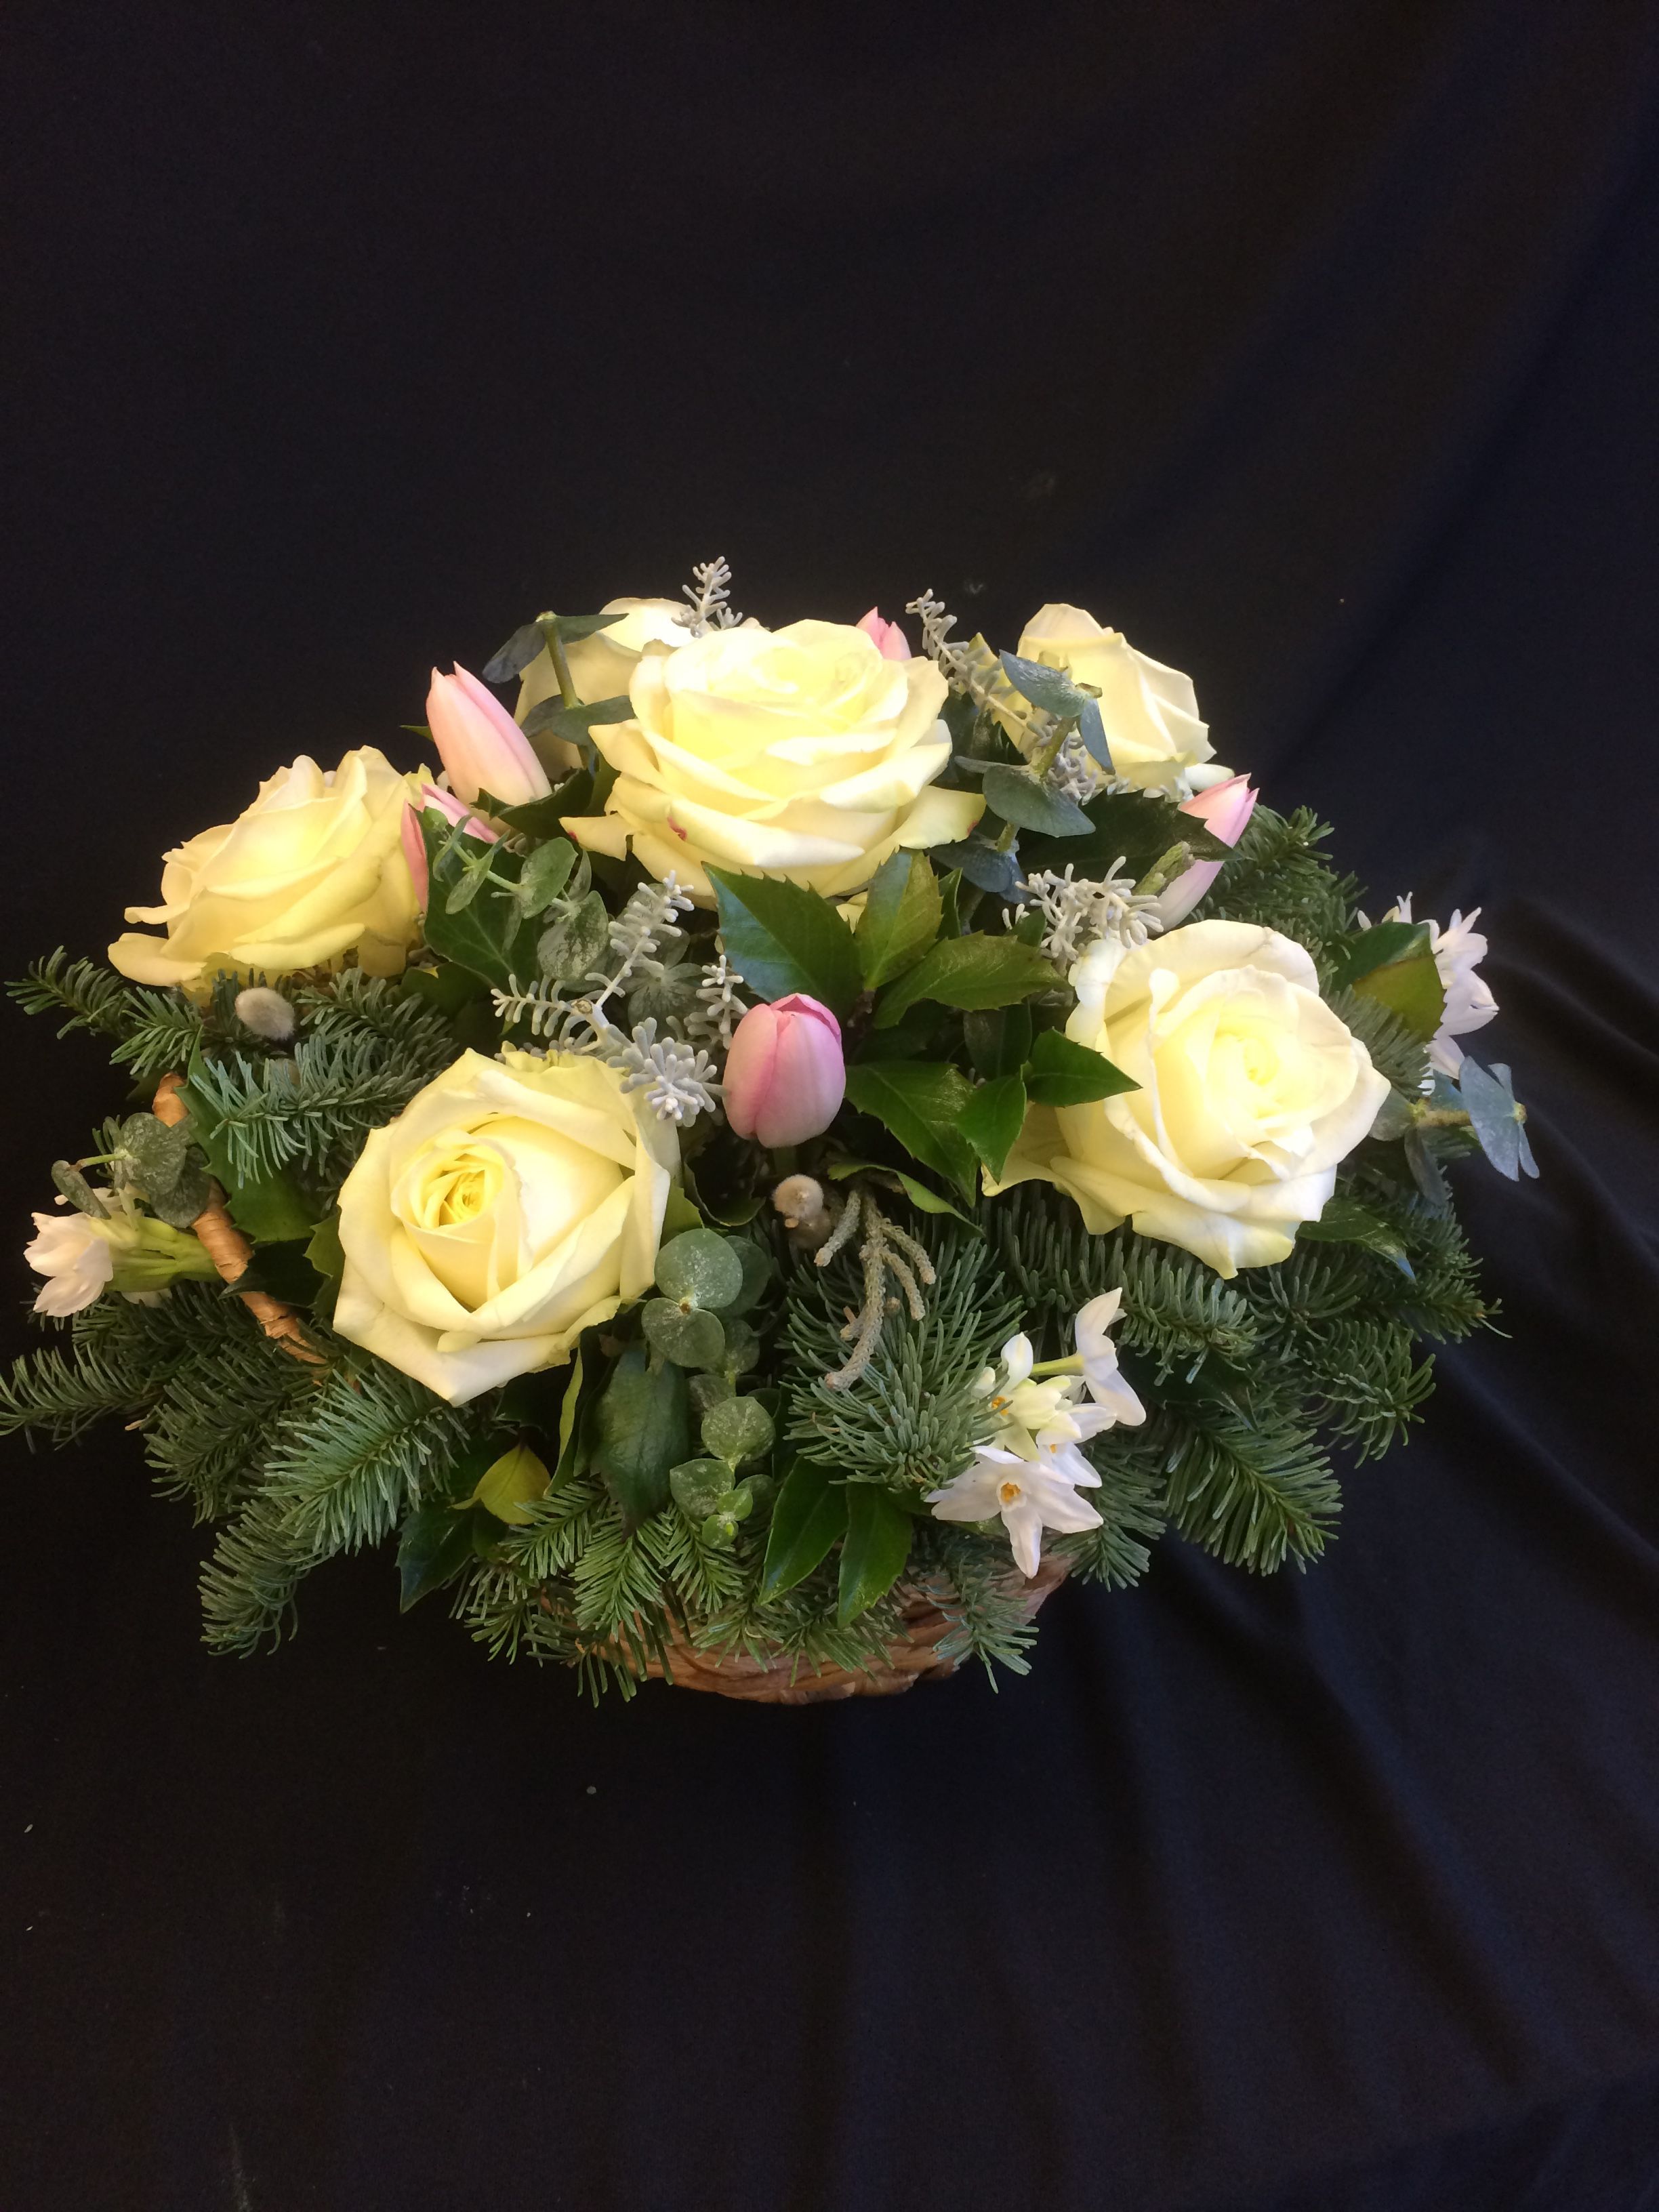 Seasonal fresh flower basket arrangement by Willow House Flowers Aylesbury florist - www.willowhouseflowers.co.uk